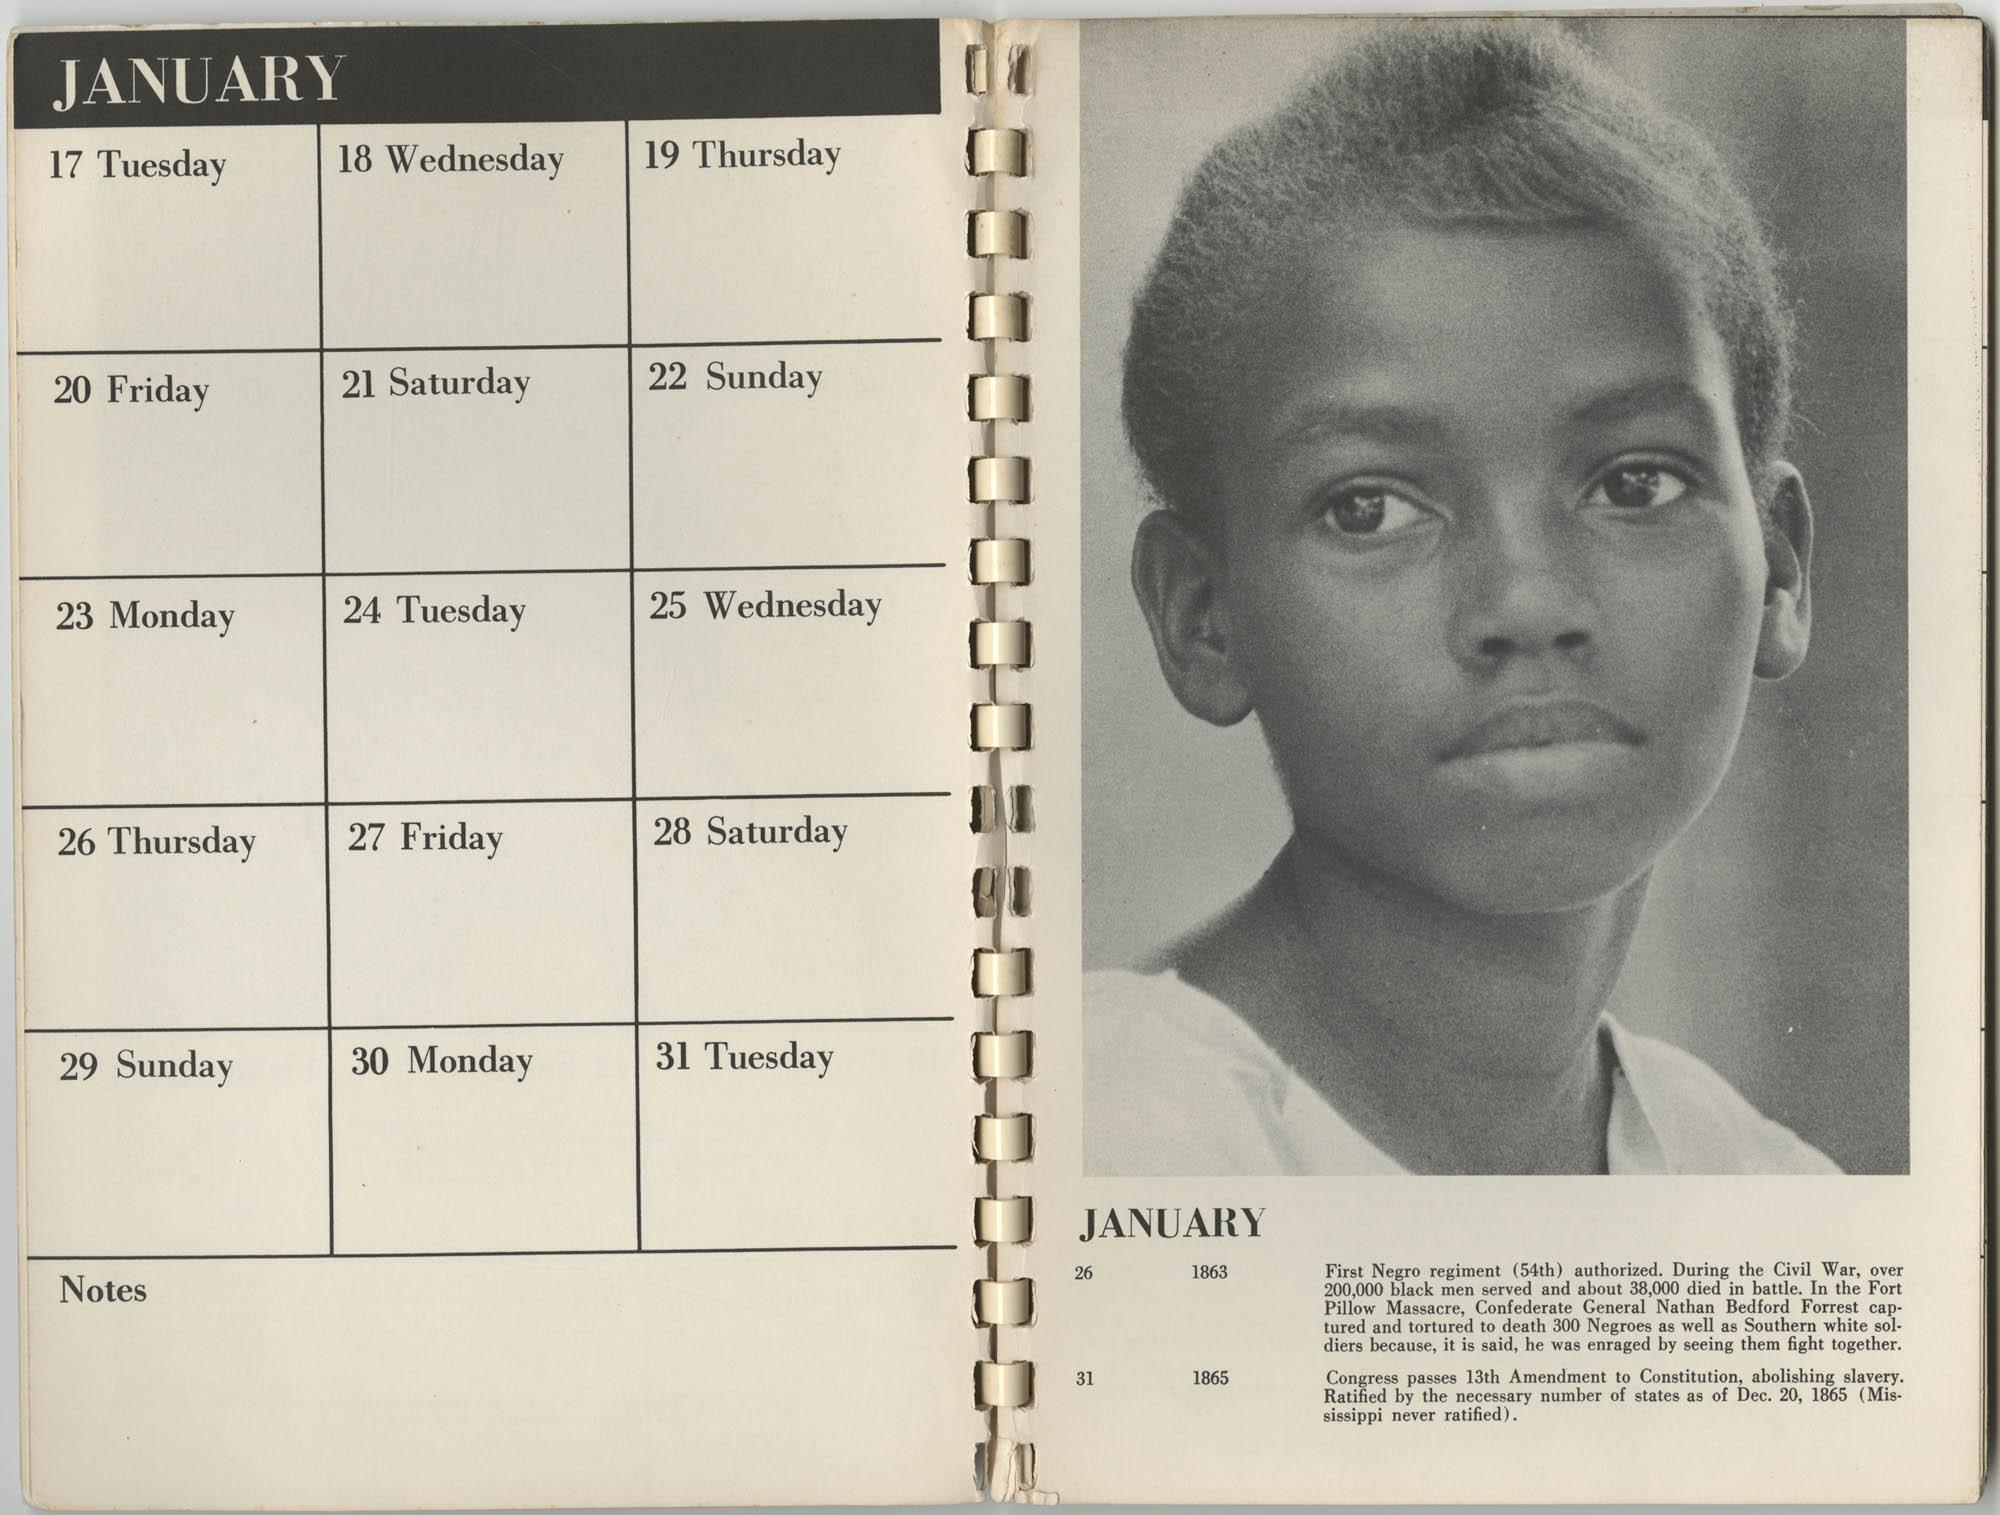 1967 SNCC Calendar, January 17-31